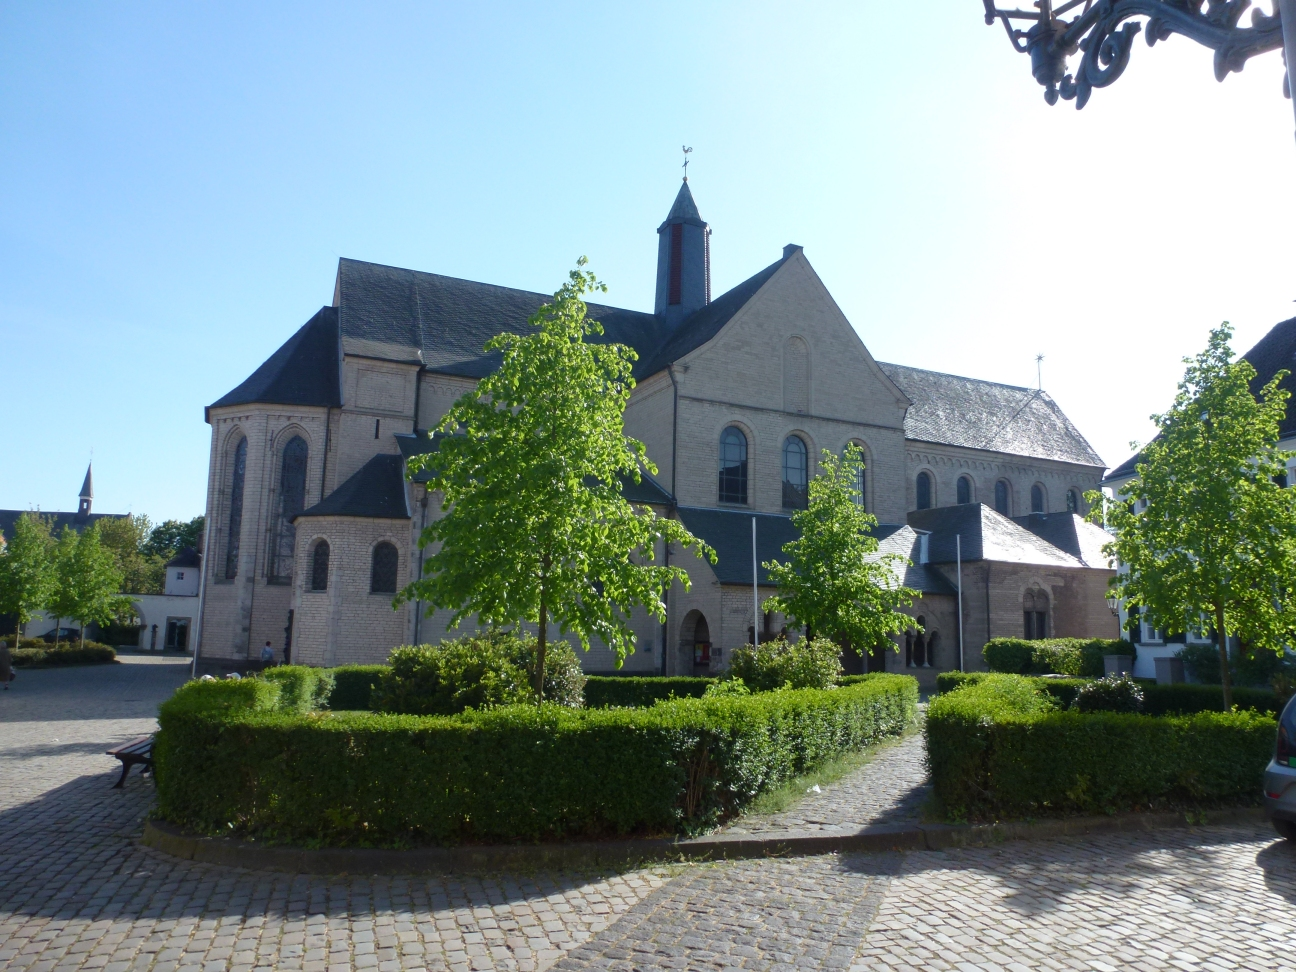 St. Suitbertus, Kaiserswerth (© Hermann-Josef Brandt)